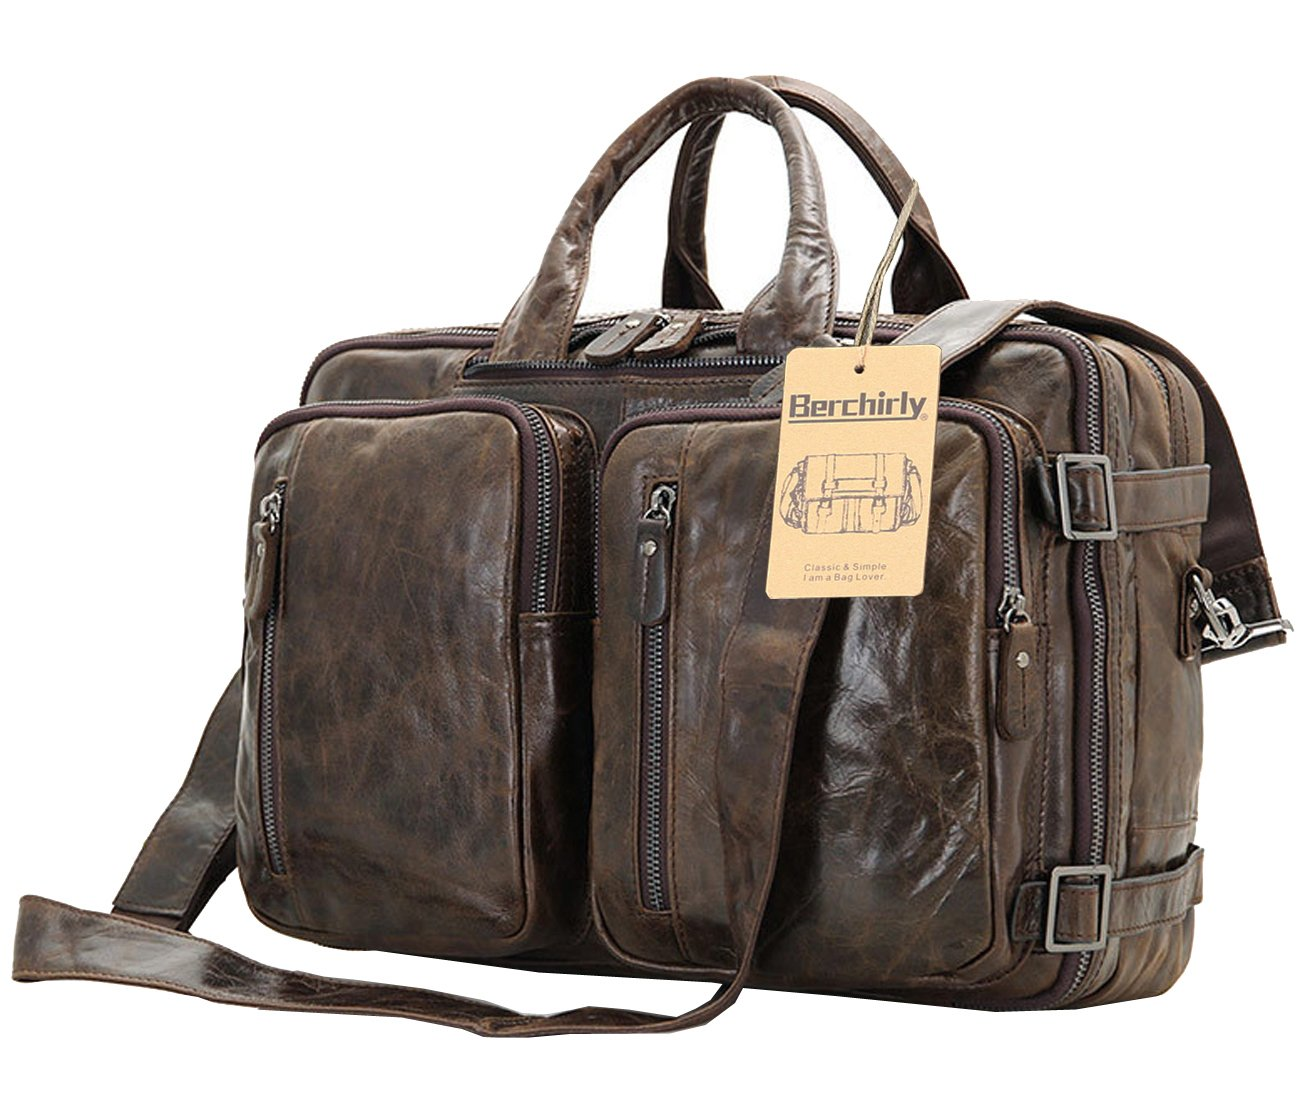 Berchirly Vintage Multifunction Genuine Leather Briefcase Expandable Laptop Backpack Messenger Bag Rucksack BookBag Daypack Case by Berchirly